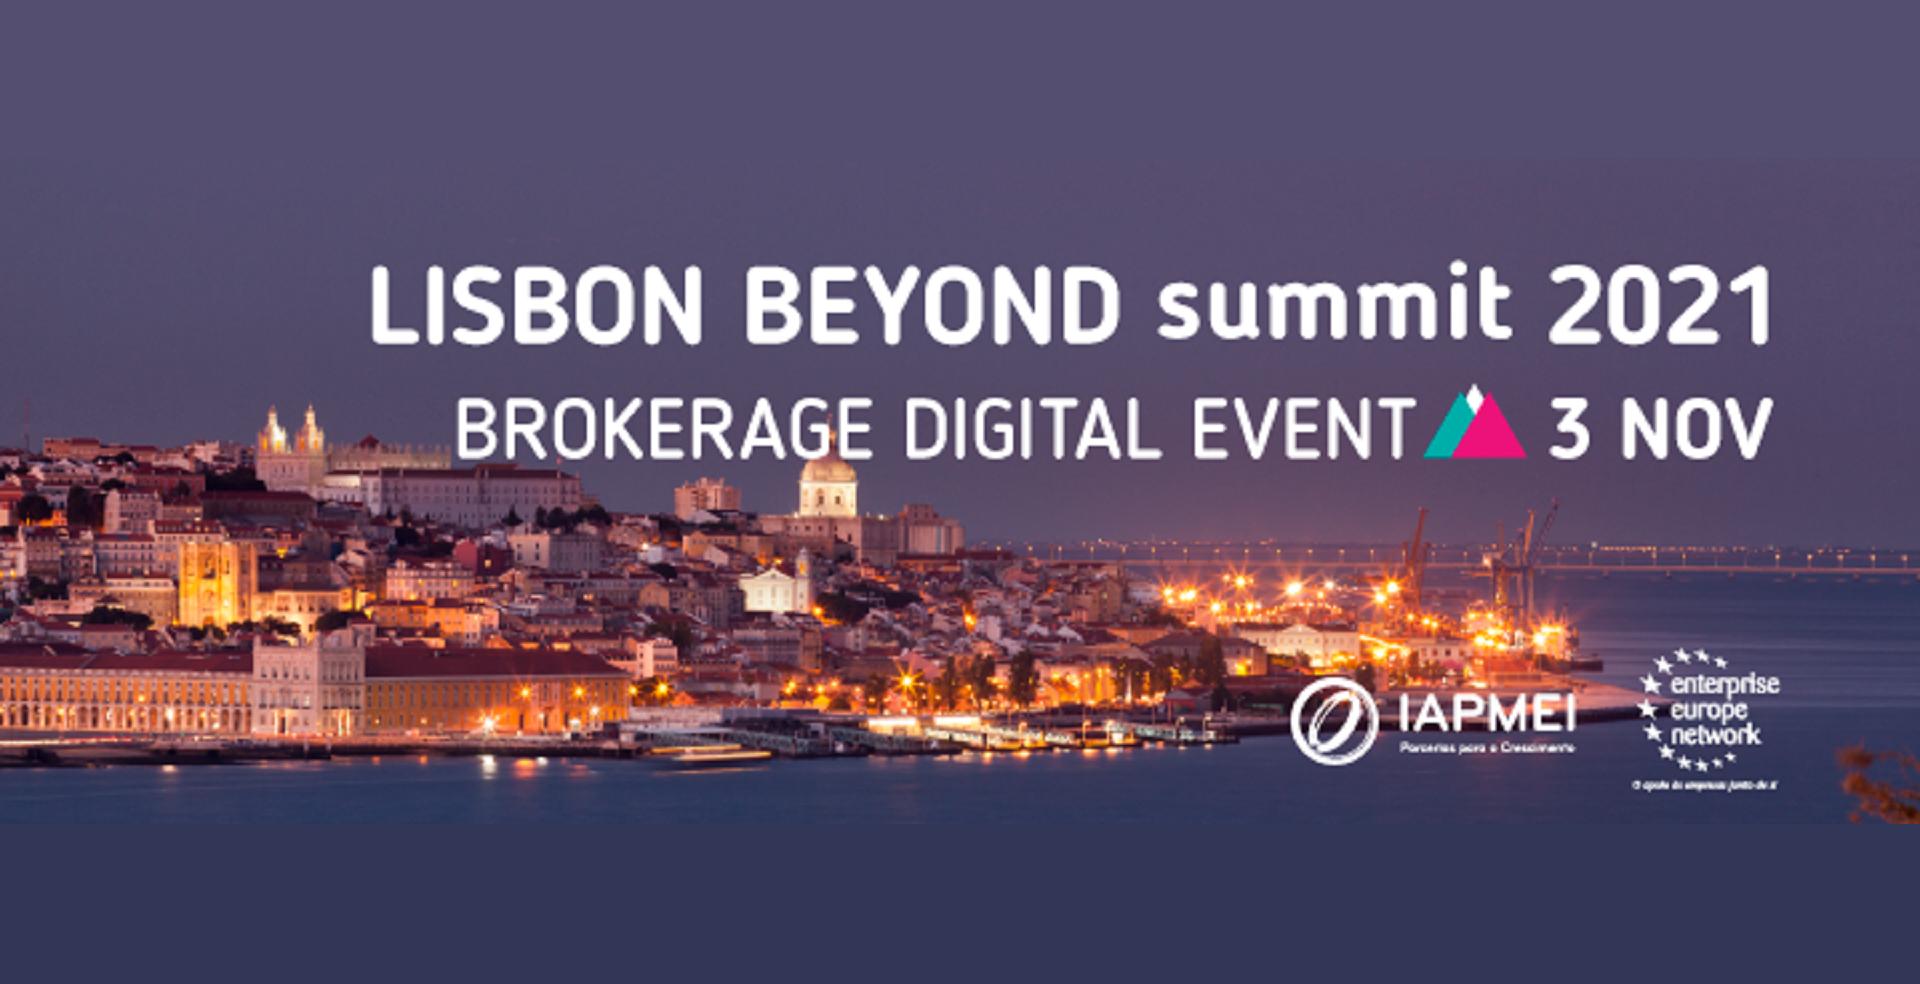 Banner - Briefly about Lisbon Beyond Summit 2021